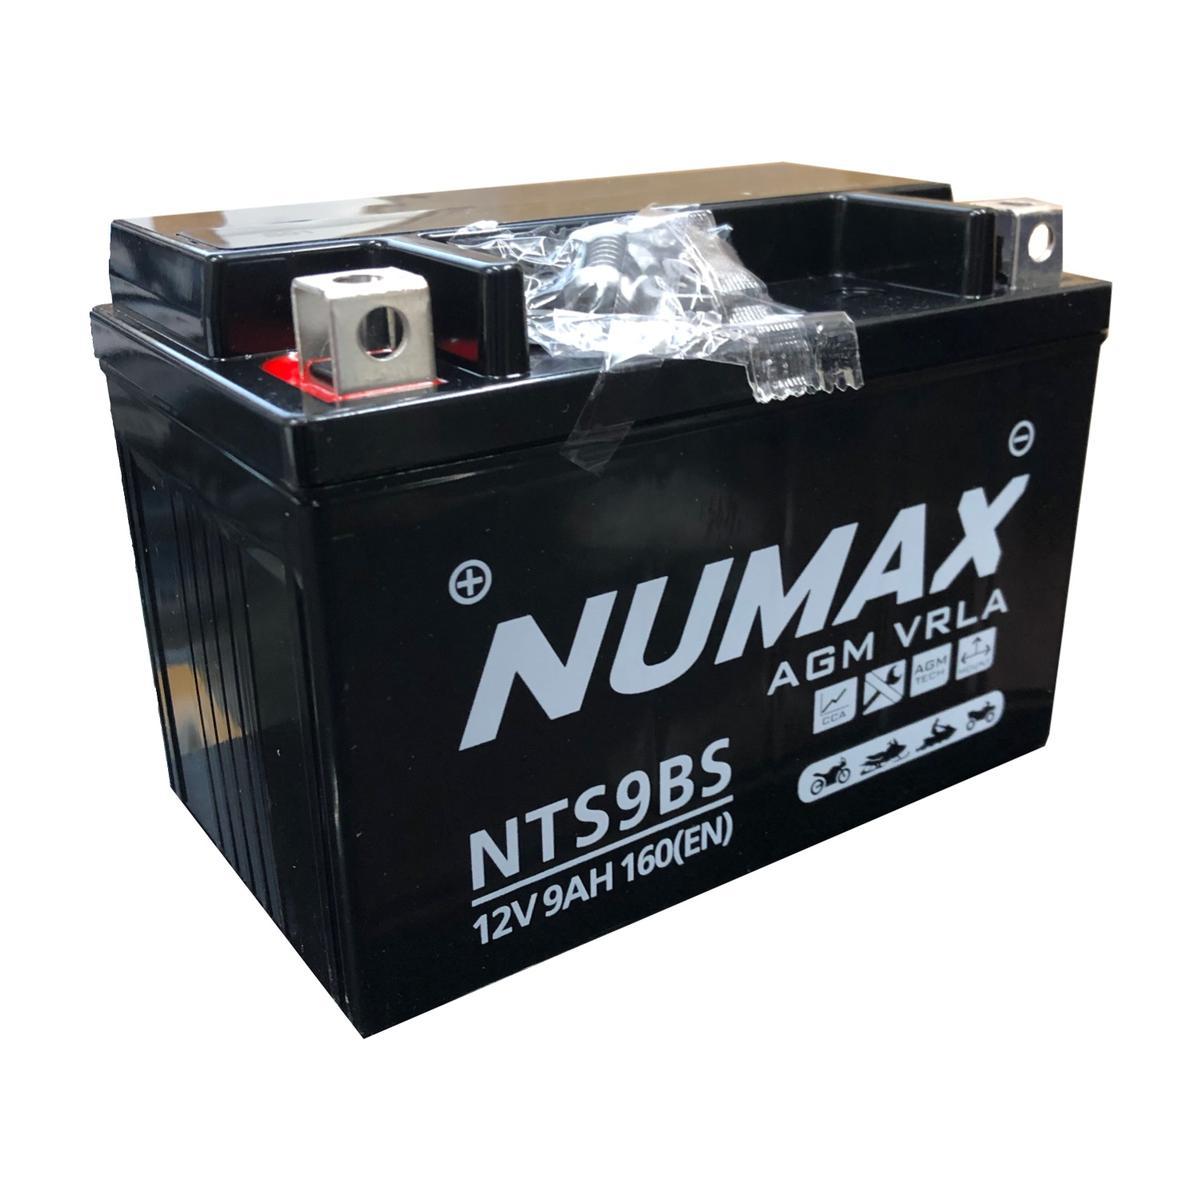 Numax NTS9BS 12v Motorbike Bike Gel Battery HONDA 900cc CBR900R YXT9-4